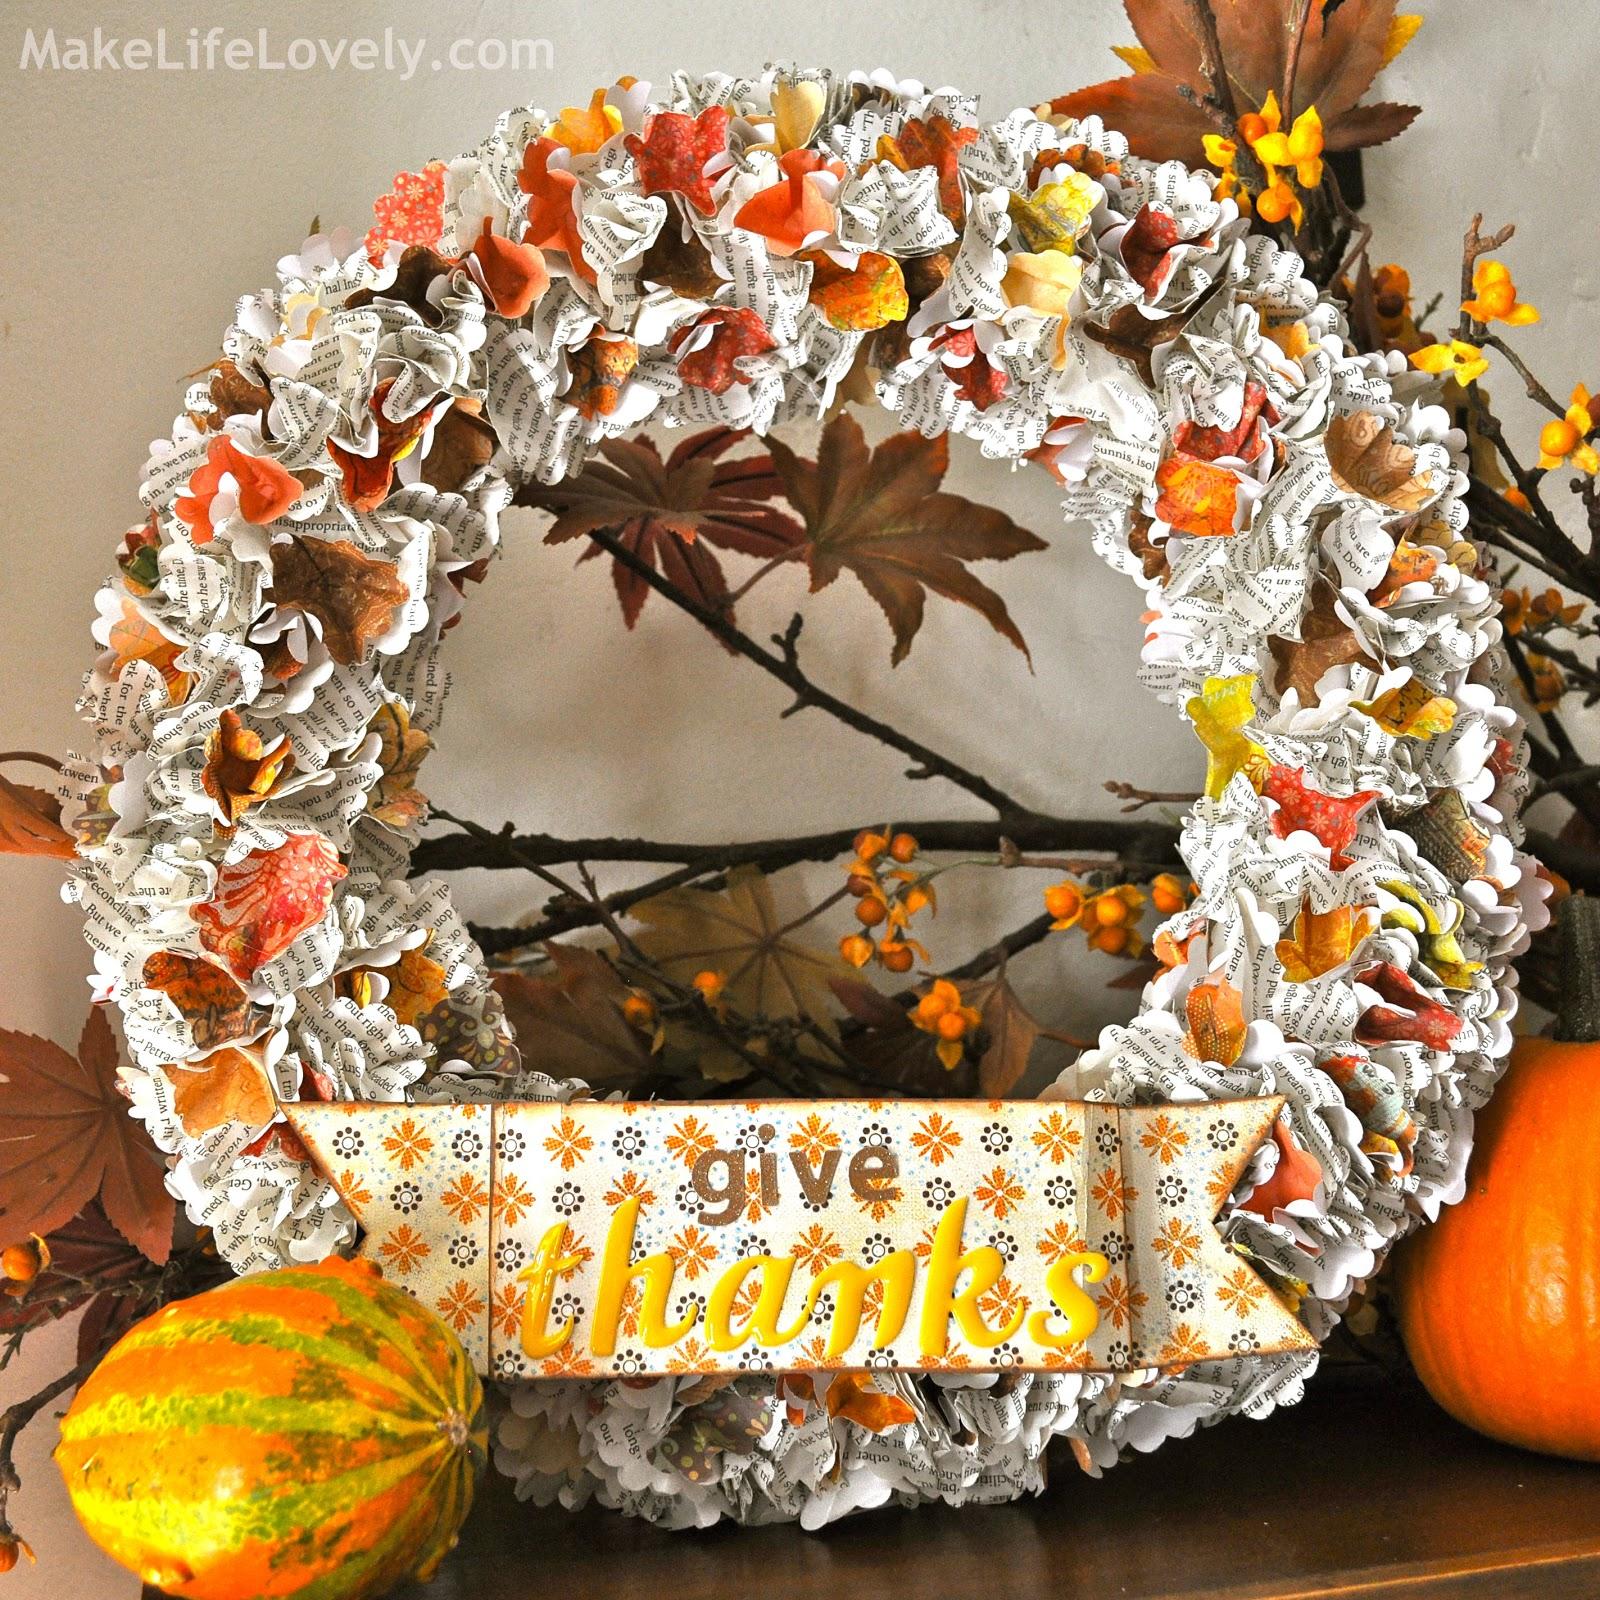 Diy thanksgiving paper decor - Diy Thanksgiving Paper Decor